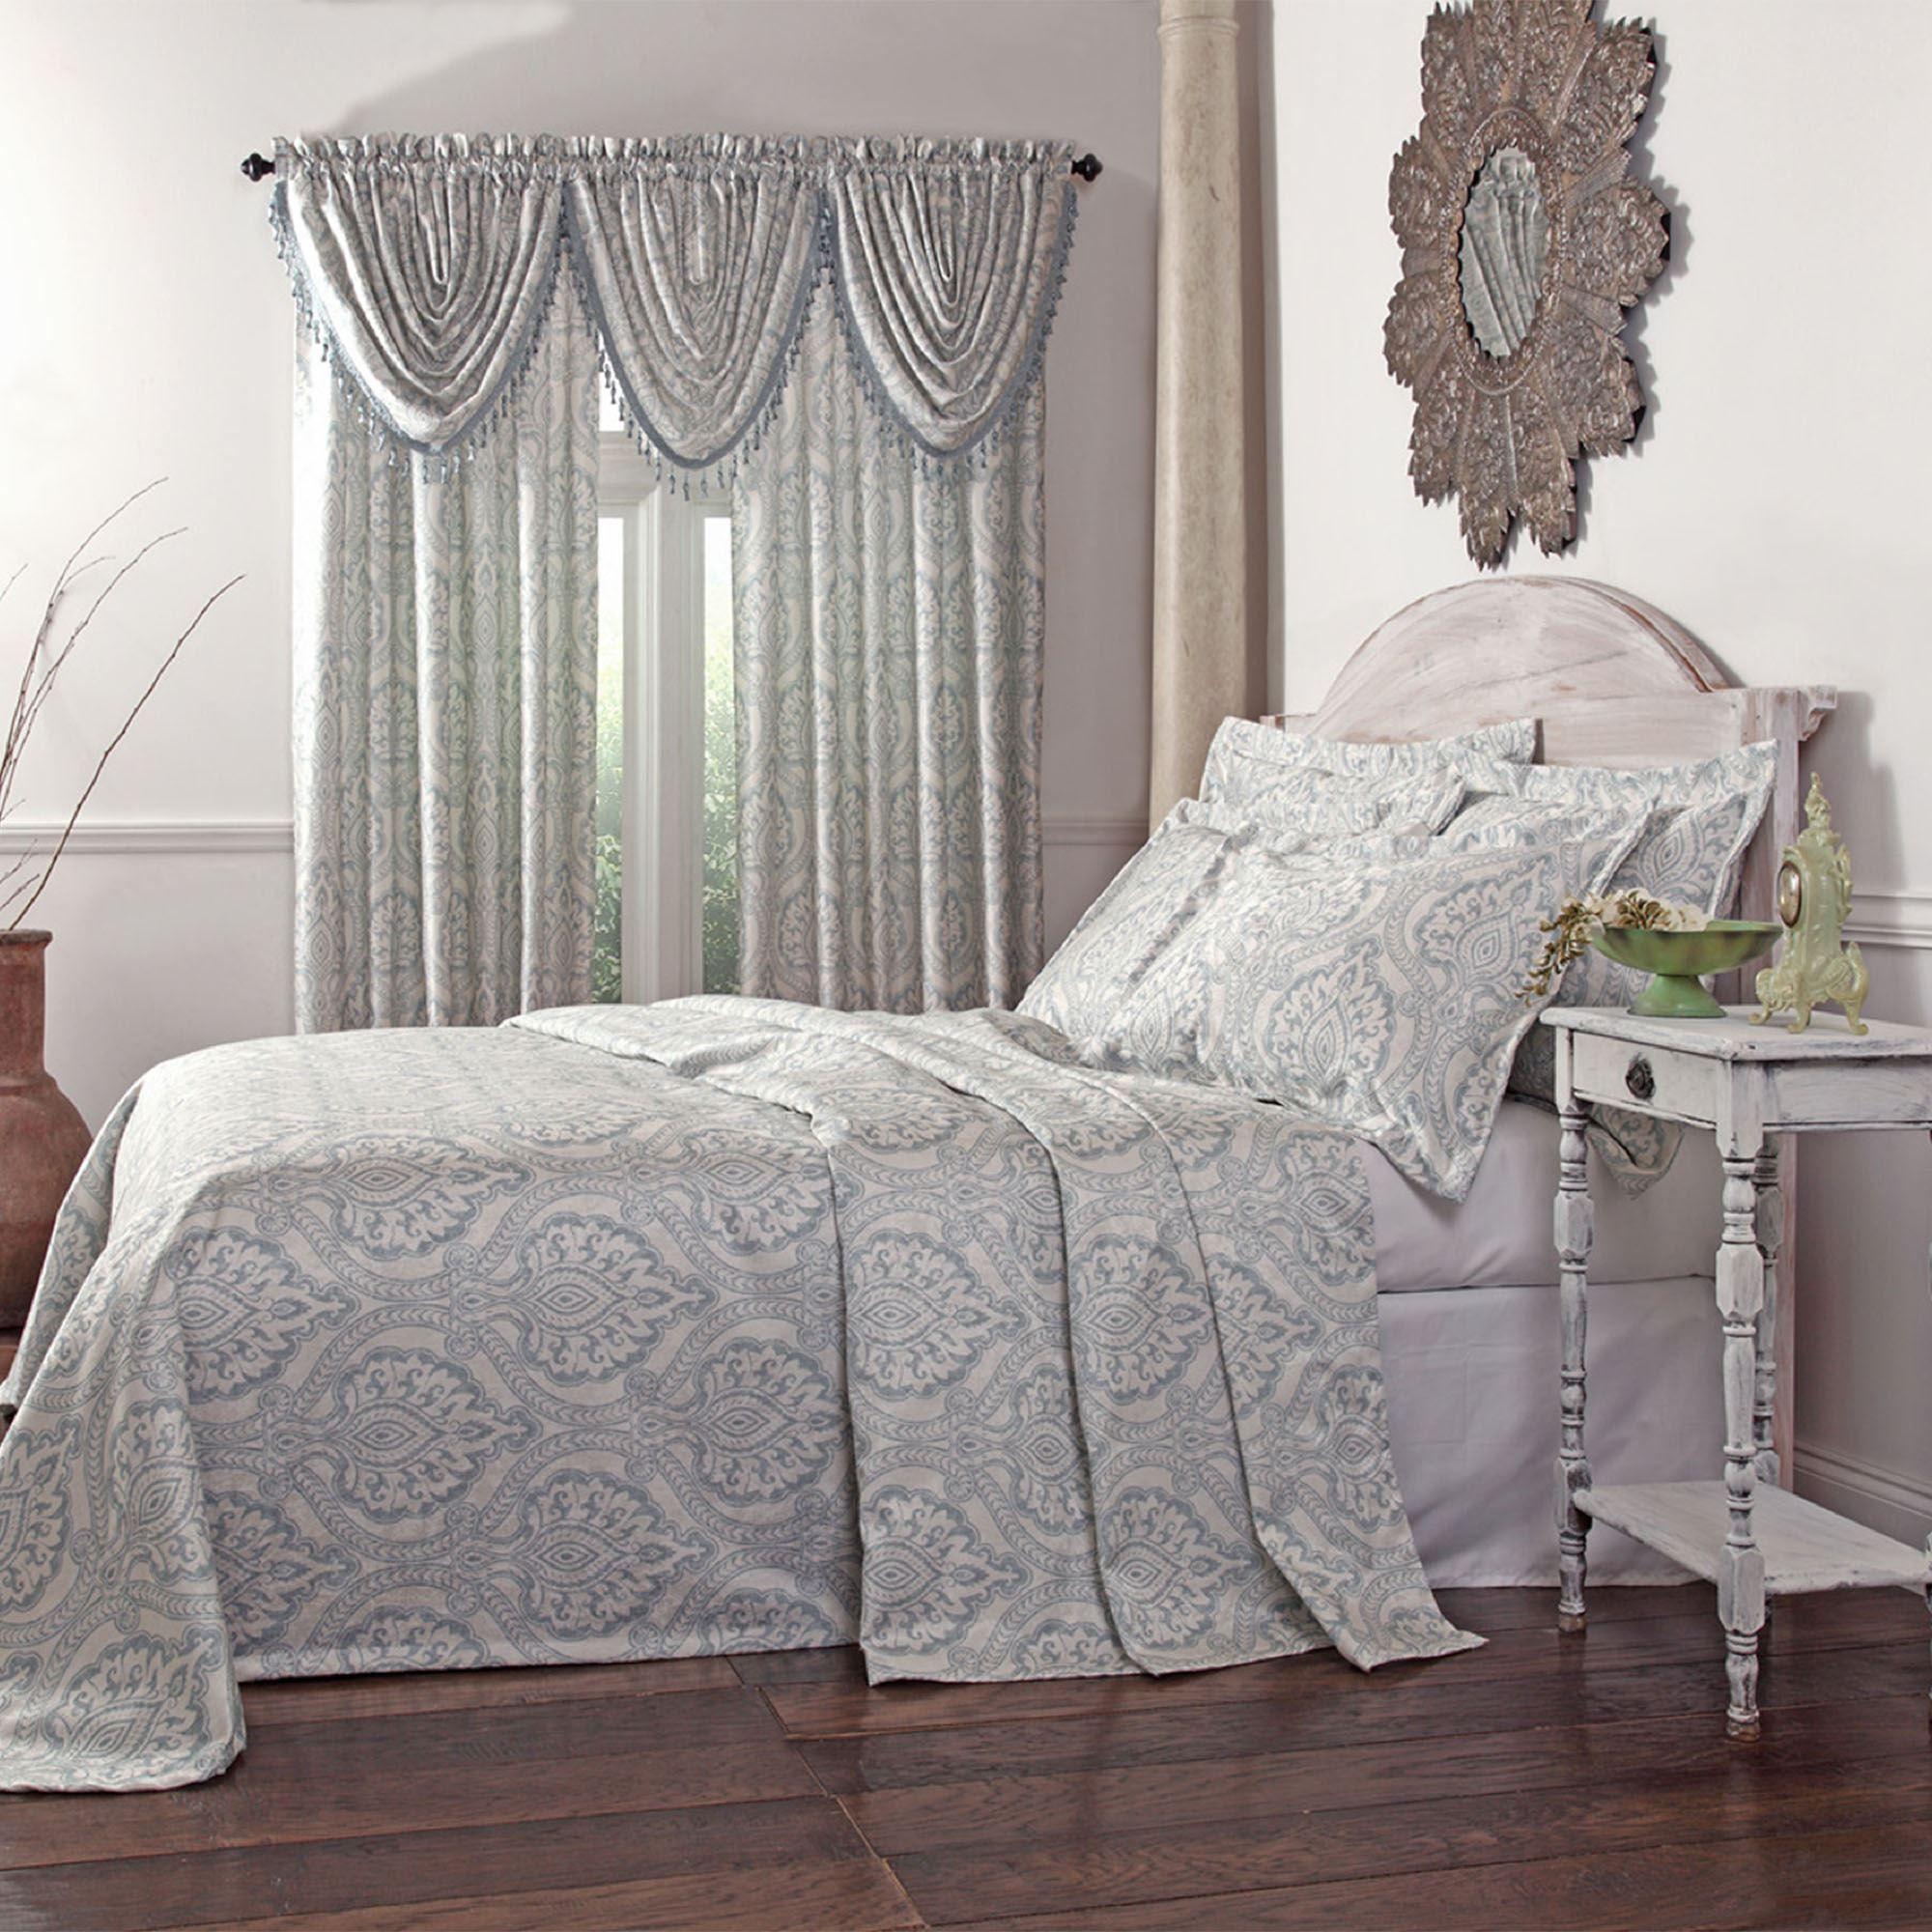 Damask Style Bedroom: Santorini Lightweight Damask Bedspread Bedding